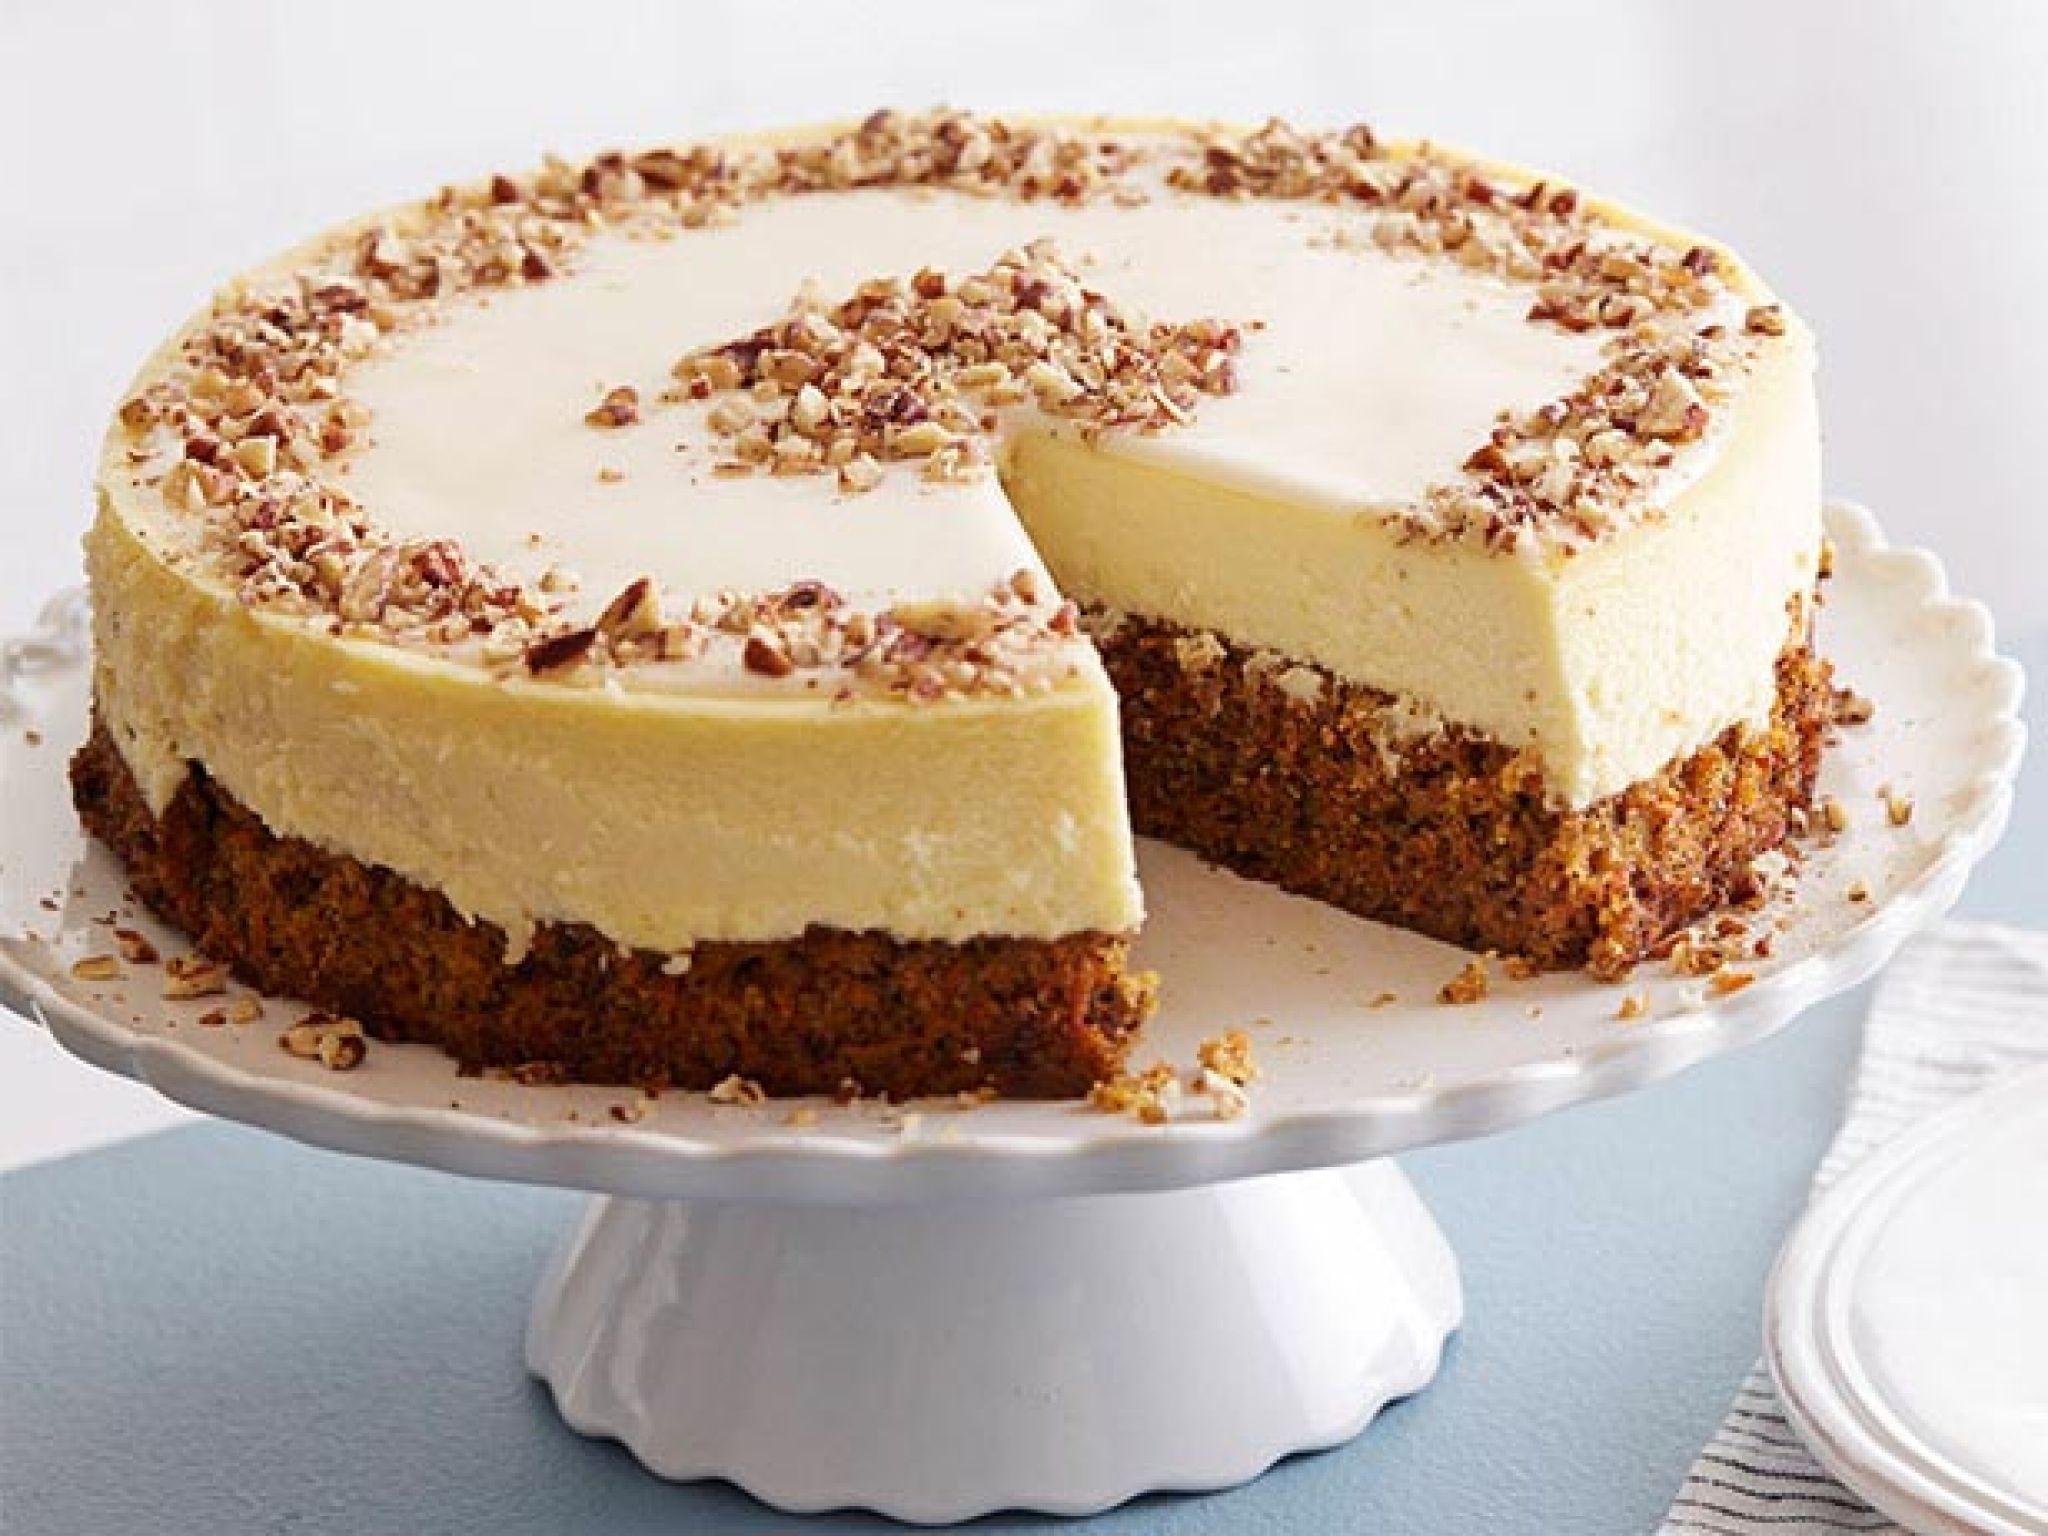 FNK Carrot Cake Cheesecakes s4x3.jpg.rend .sniipadlarge 1